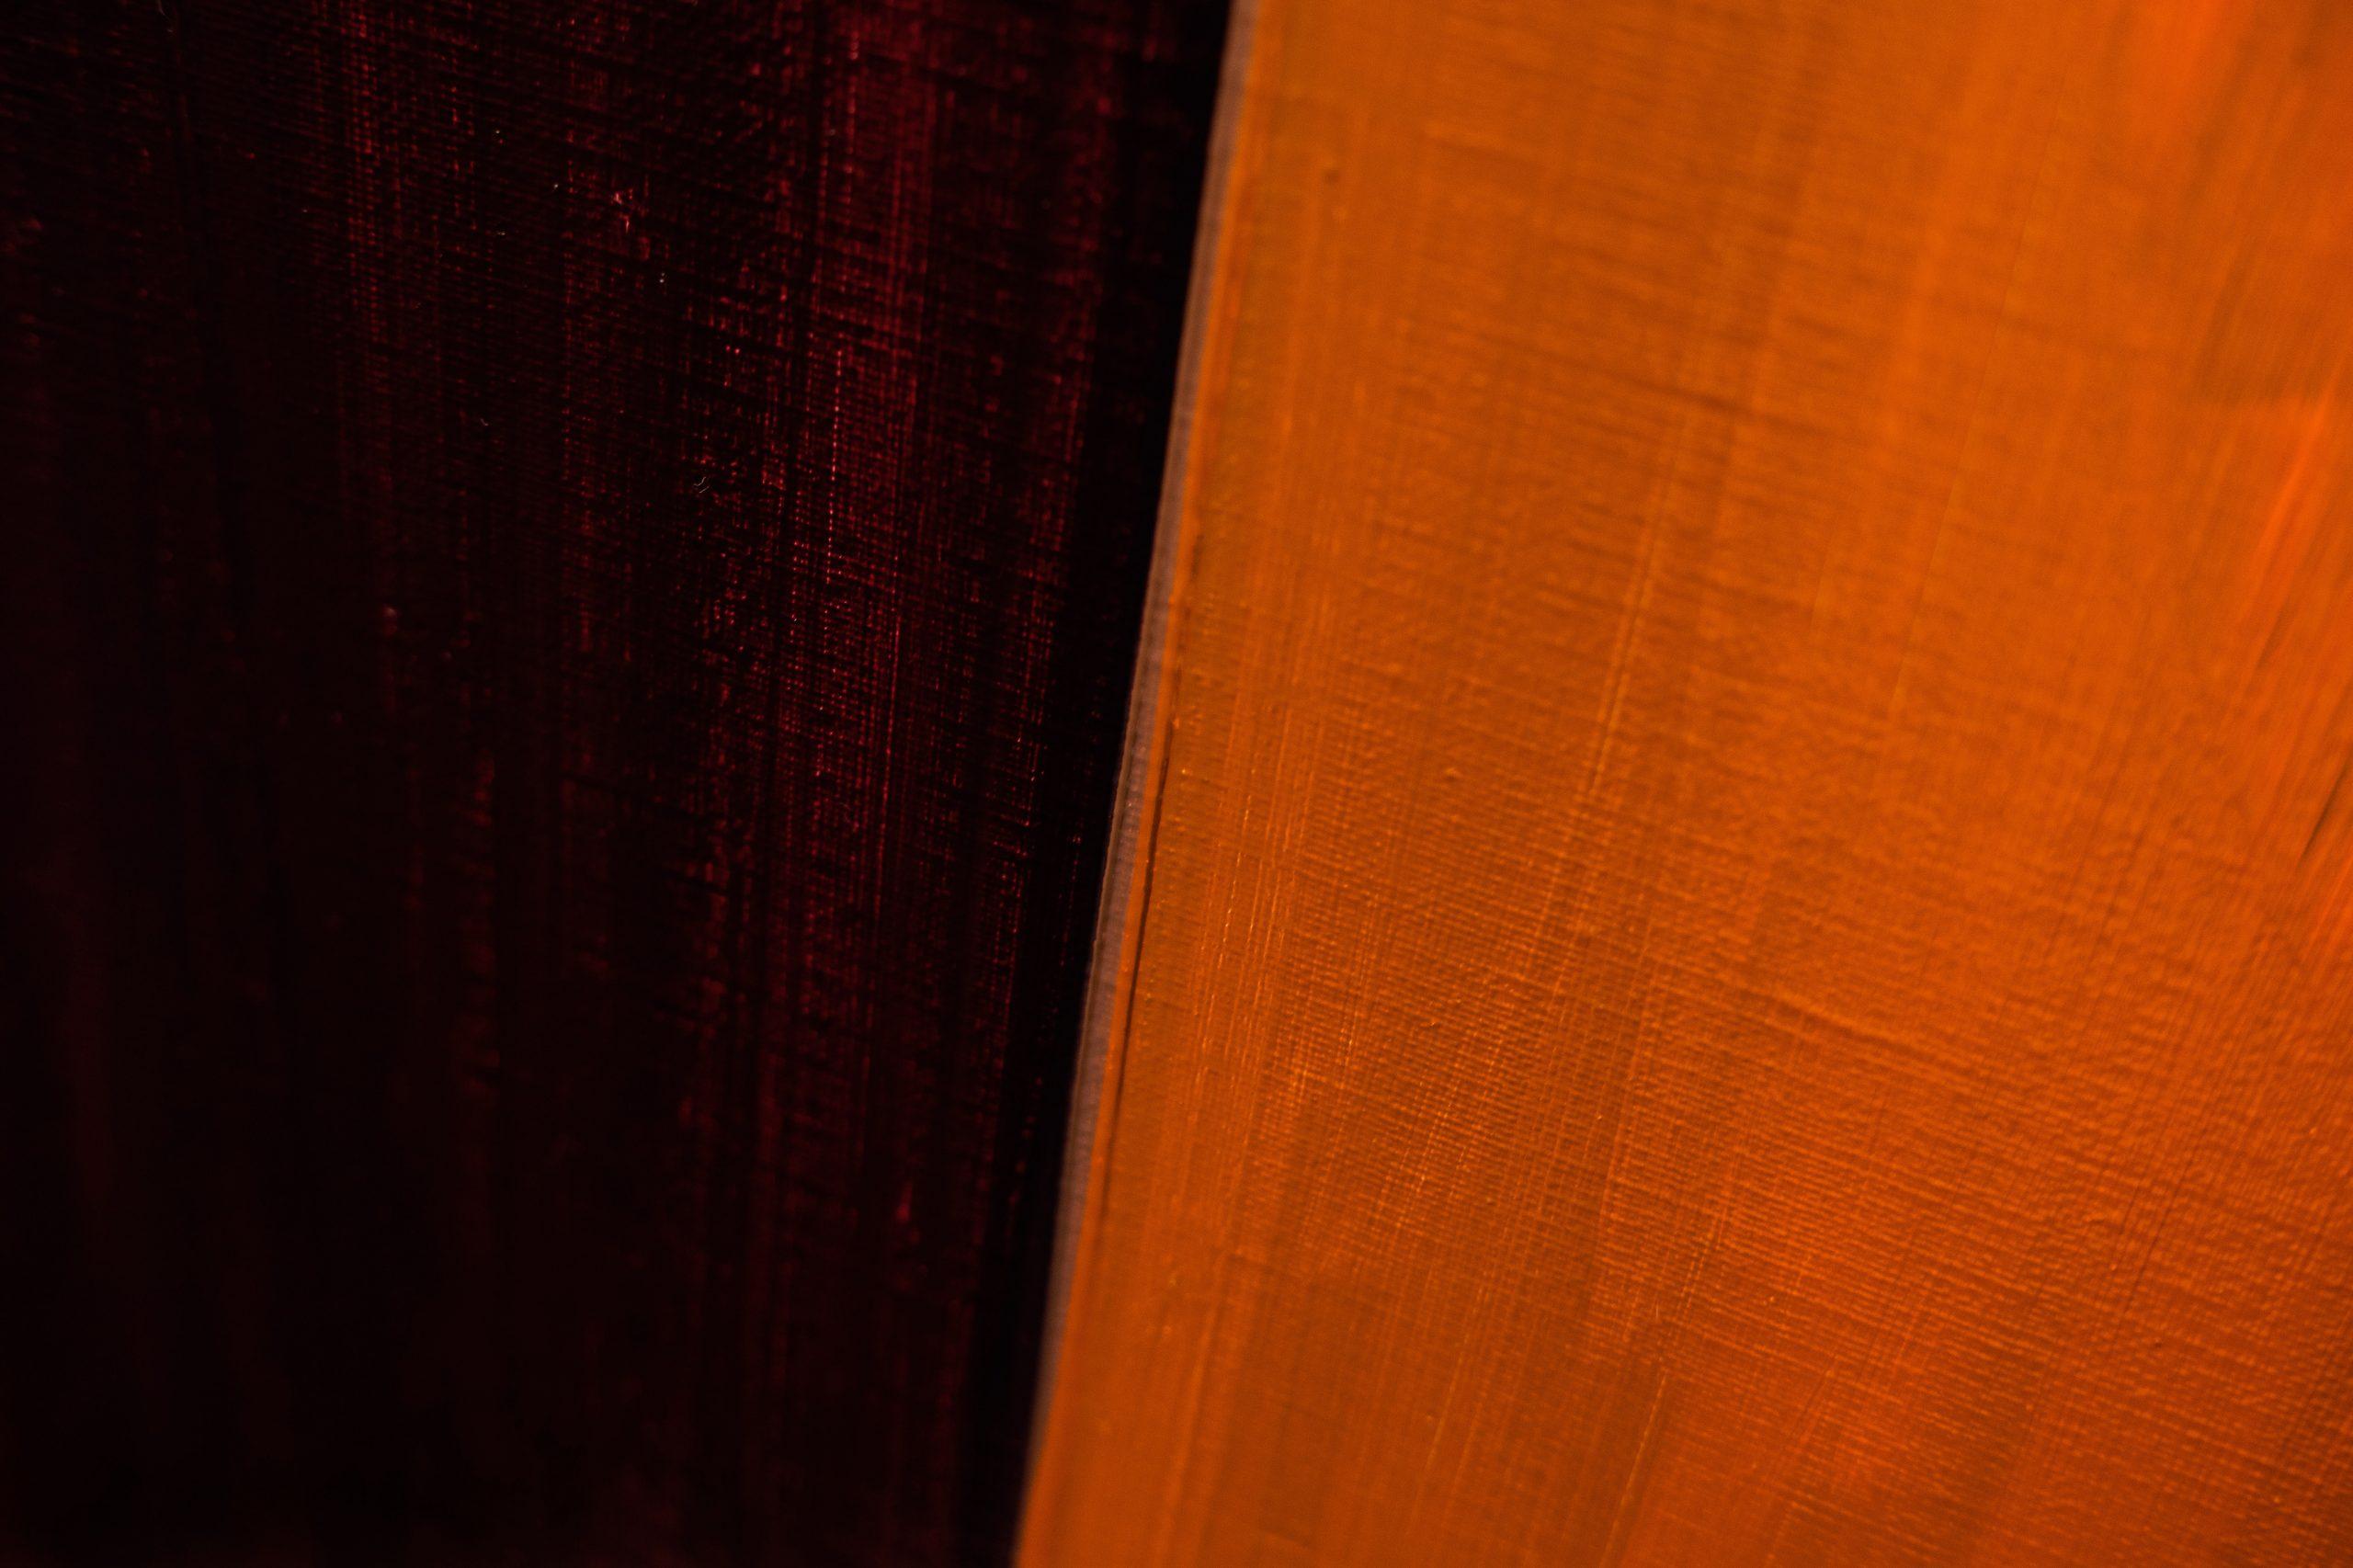 Philosophy-3 叙情と静寂-私たちが失いかけた『生命を宿す〈線〉』を描く